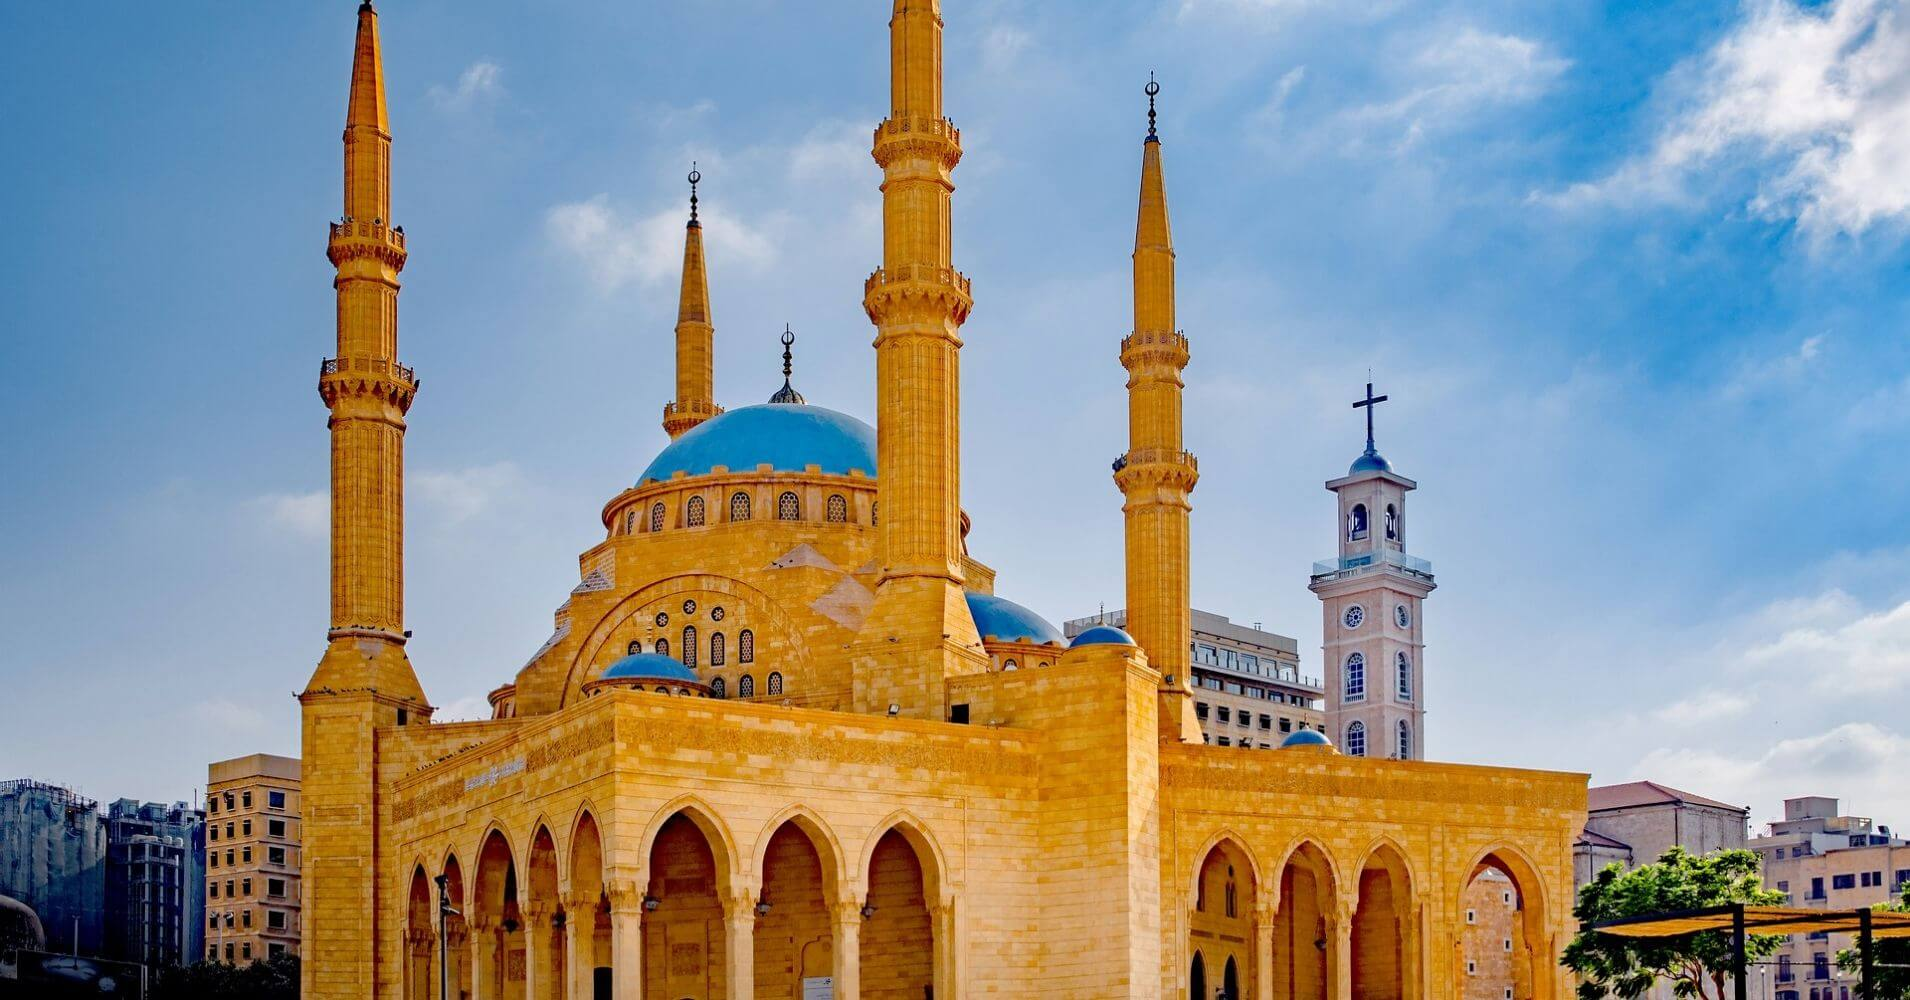 Mezquita Mohammad Al-Amin Mosque. Líbano.